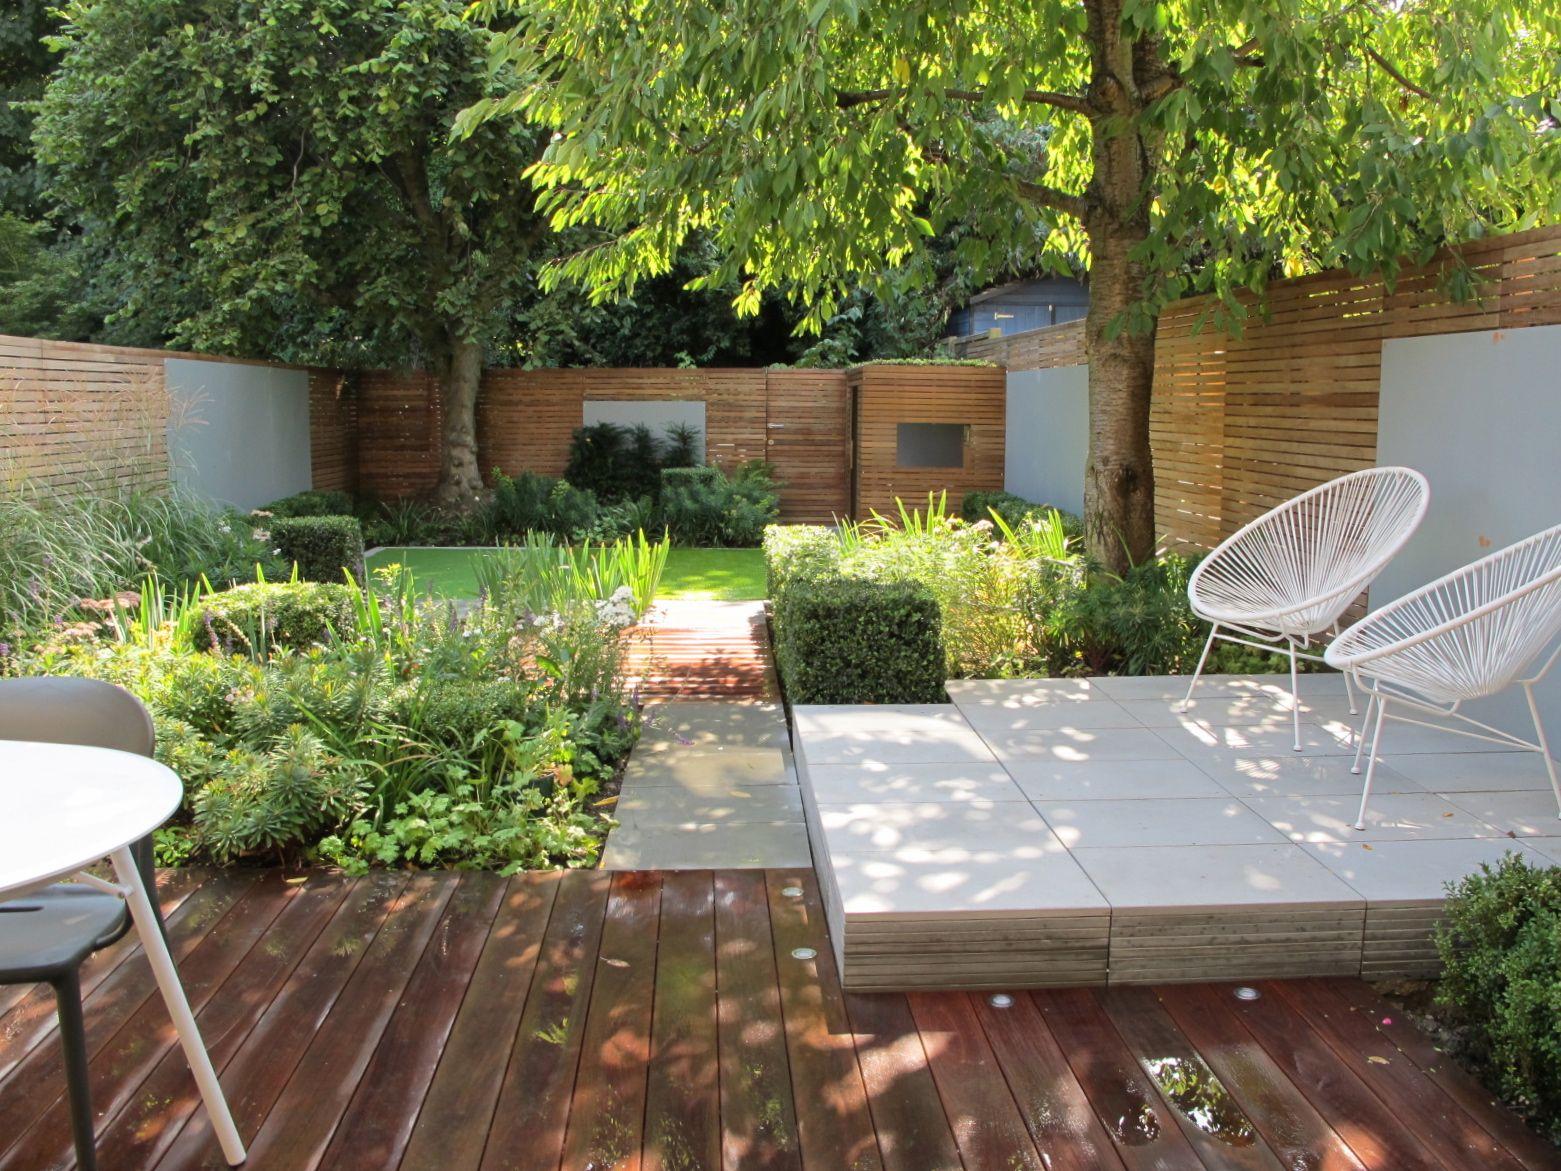 Petit Jardin Design À L'abri Des Regards. | Garden - Terrace ... pour Abri Jardin Design